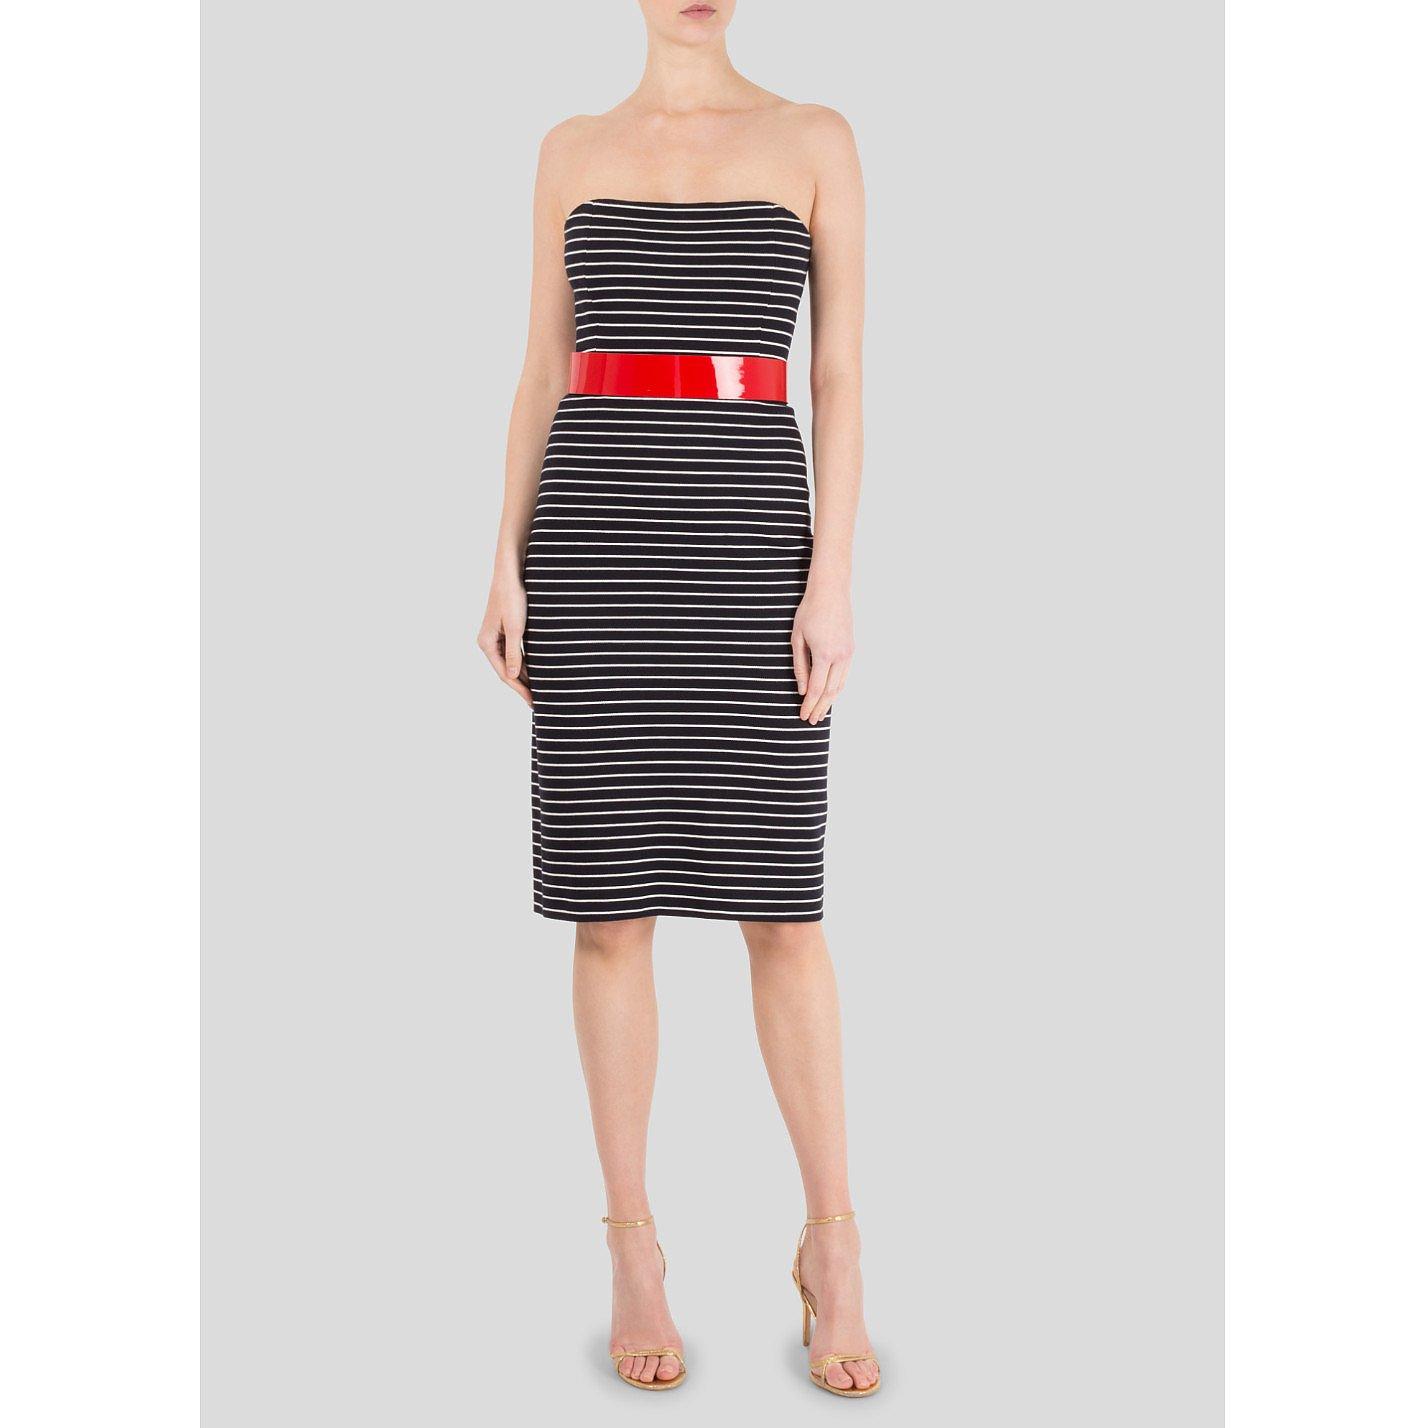 Michael Kors Nautical Striped Strapless Dress